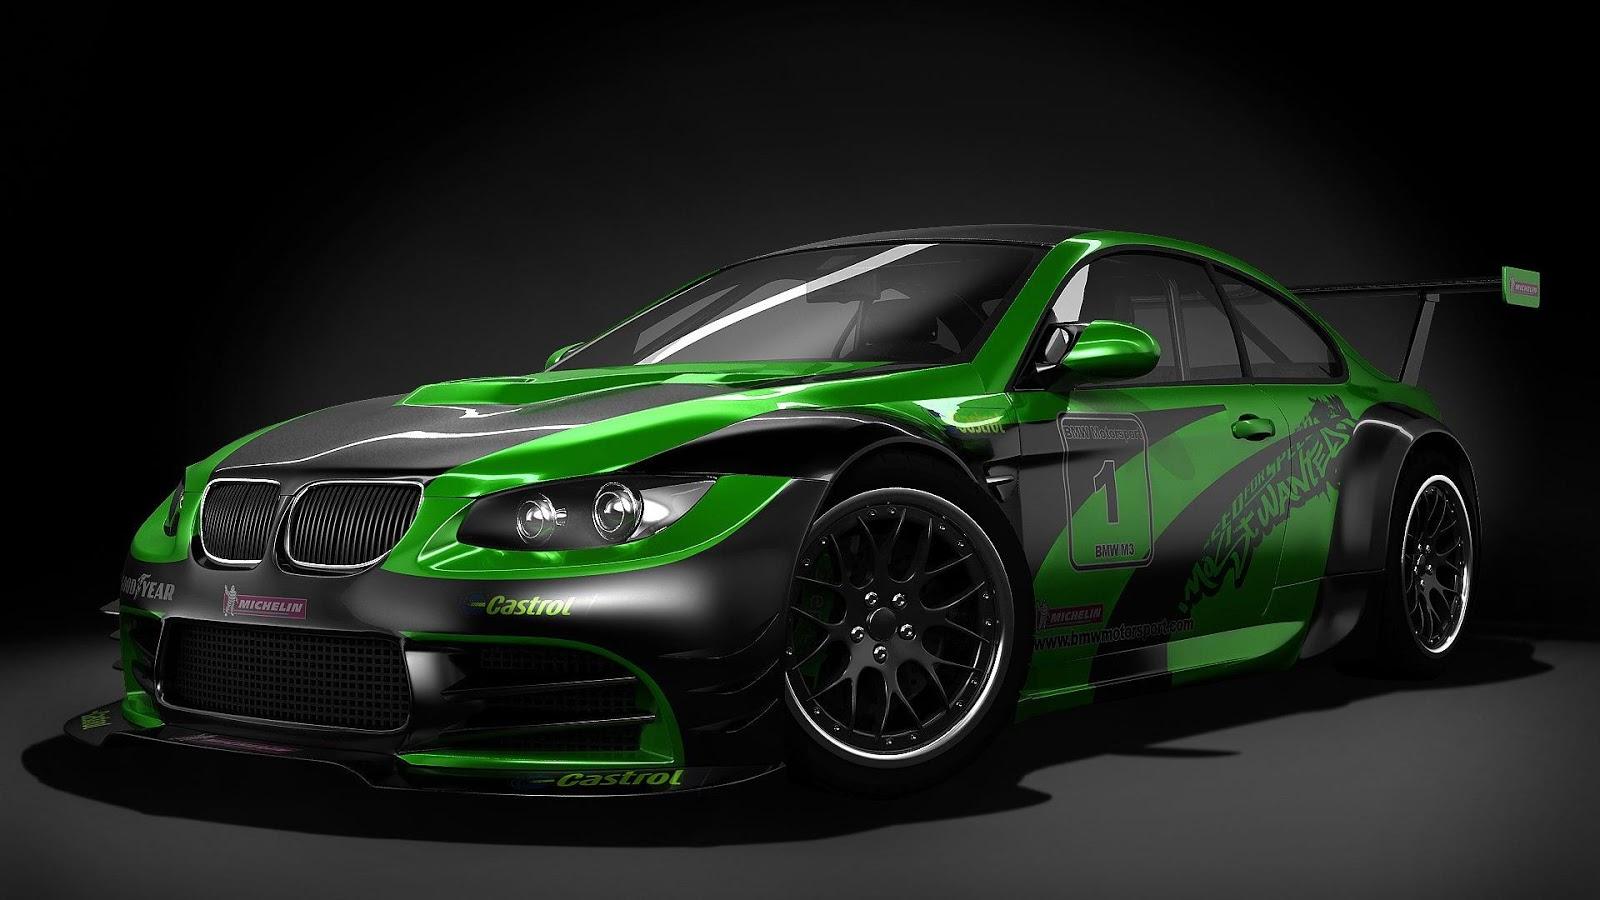 BMW Castrol Car | Full HD Desktop Wallpapers 1080p